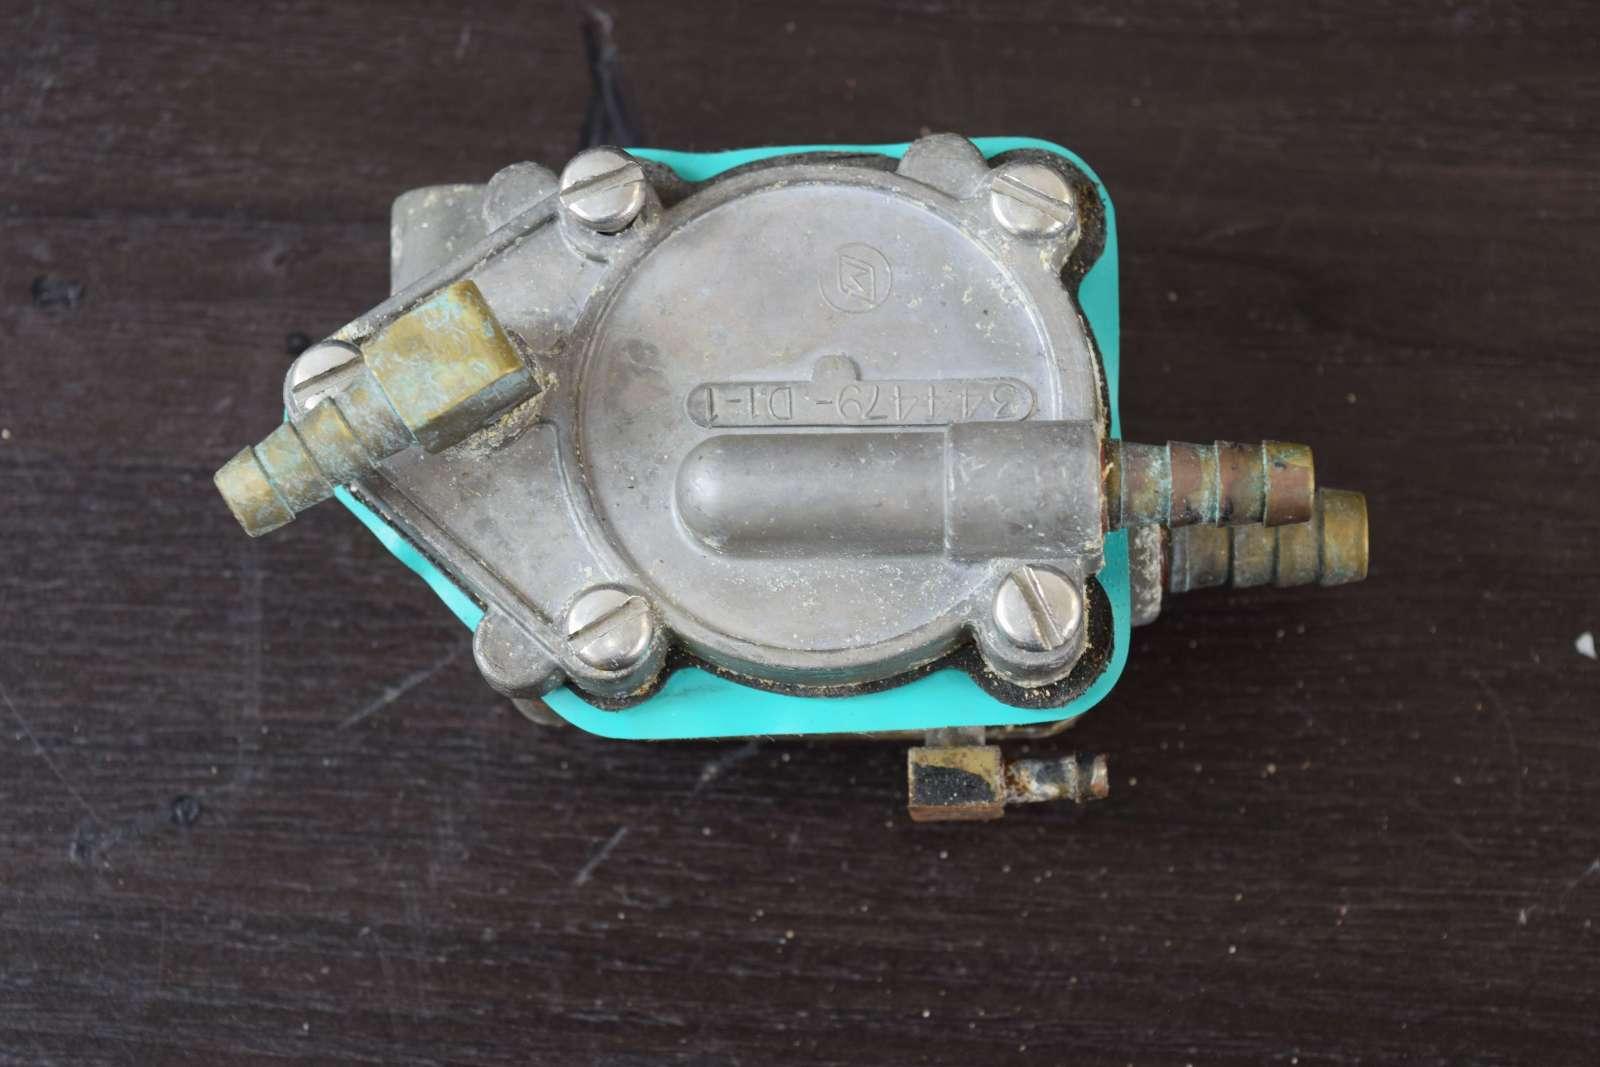 439849 438815 Johnson Evinrude 1997-1998  Fuel Lift Pump Assembly 150 175 HP